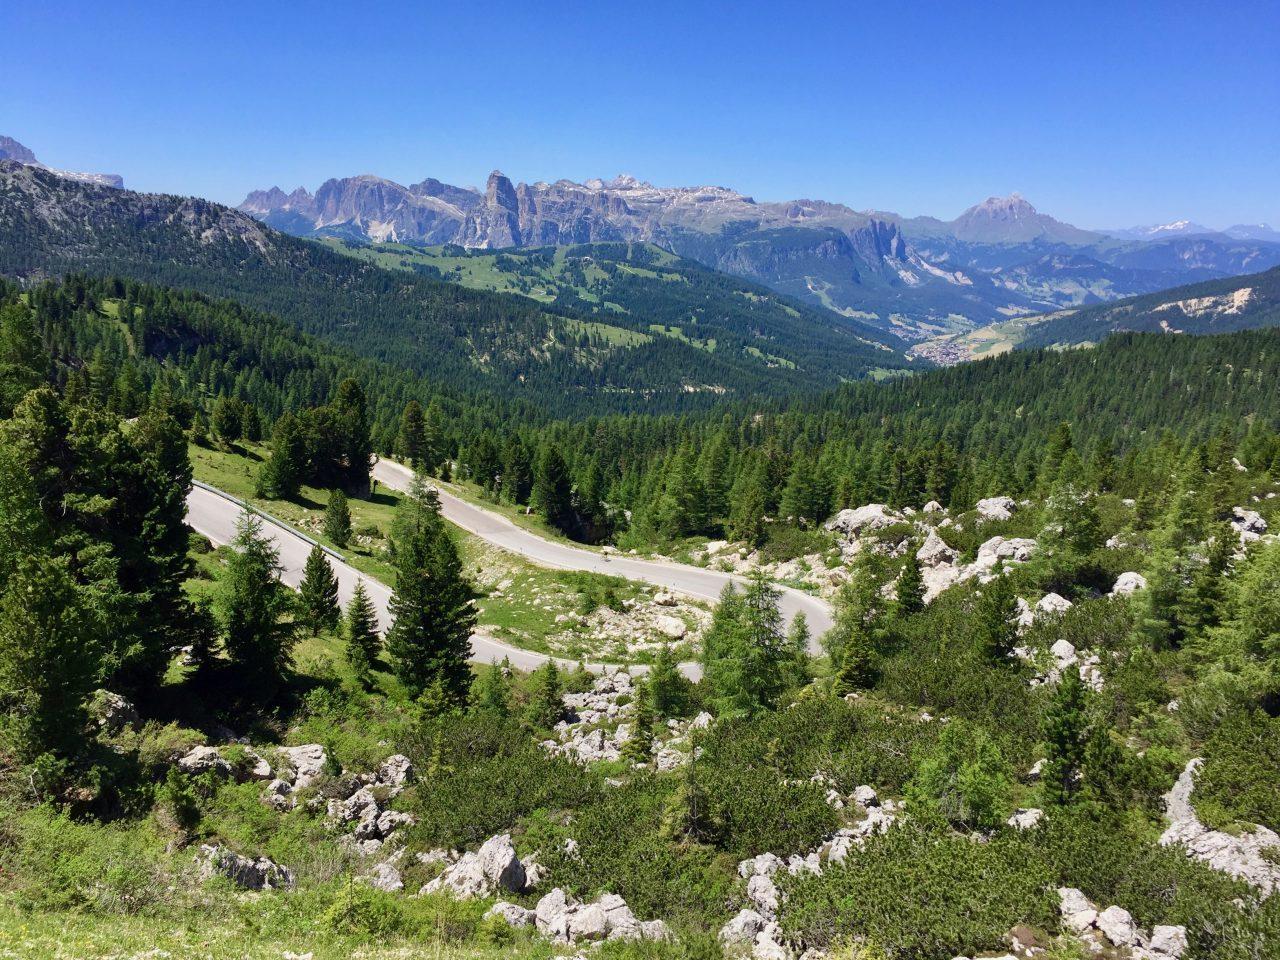 Abfahrt, Passo Valparola, Dolomites, Italy